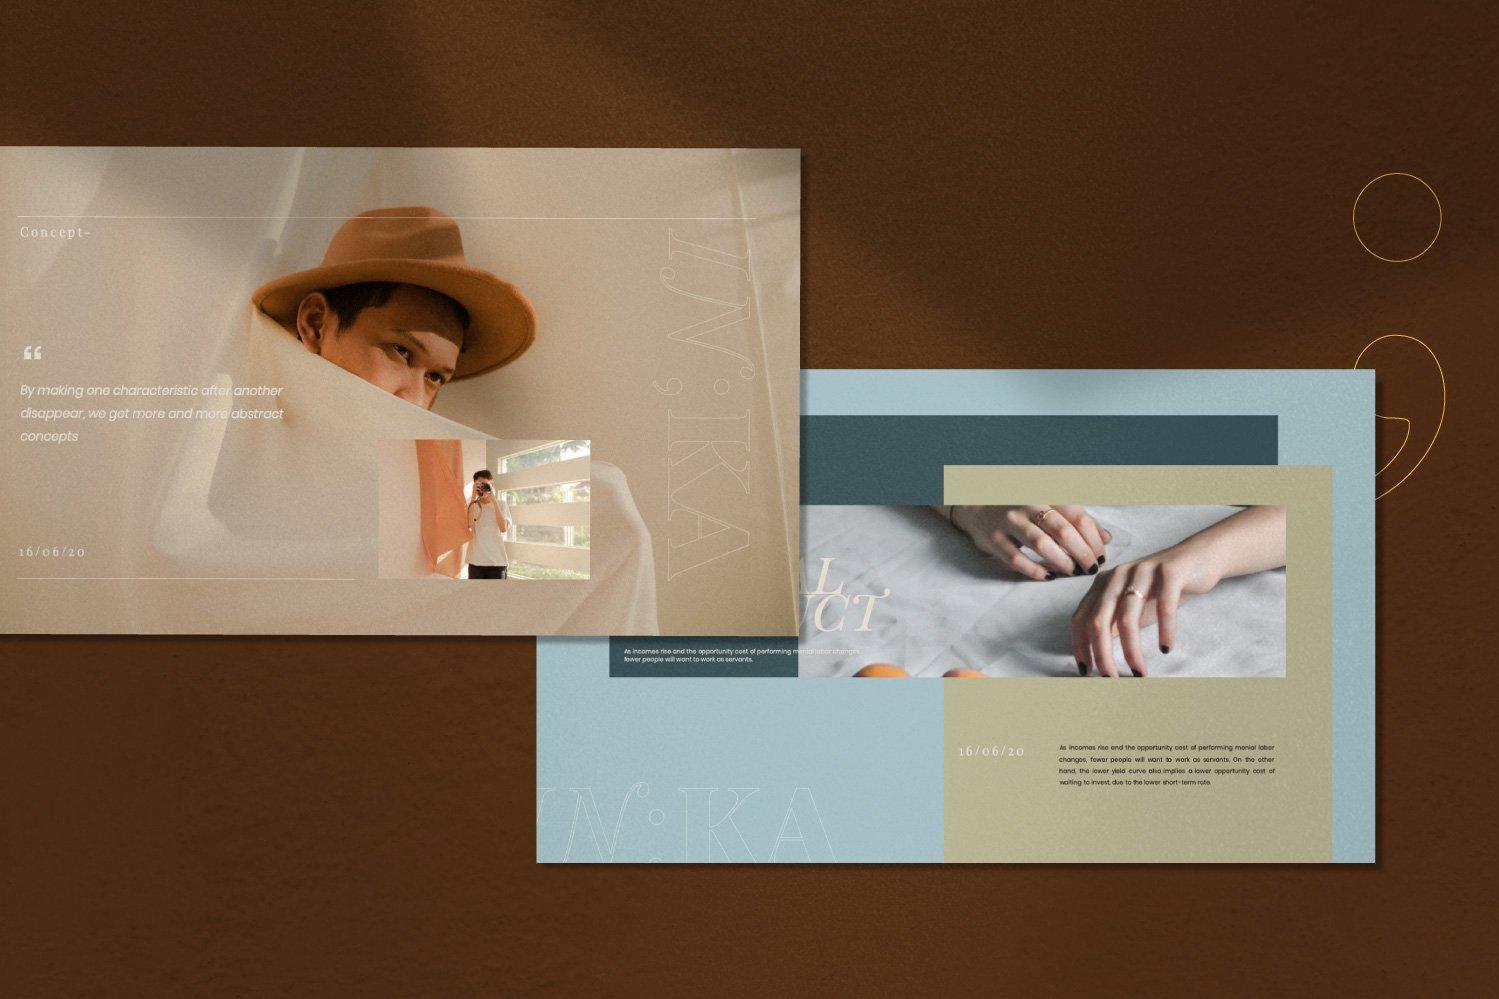 时尚创意服装摄影作品集幻灯片设计模板 Iconic – Fashion Lookbook PowerPoint插图(9)